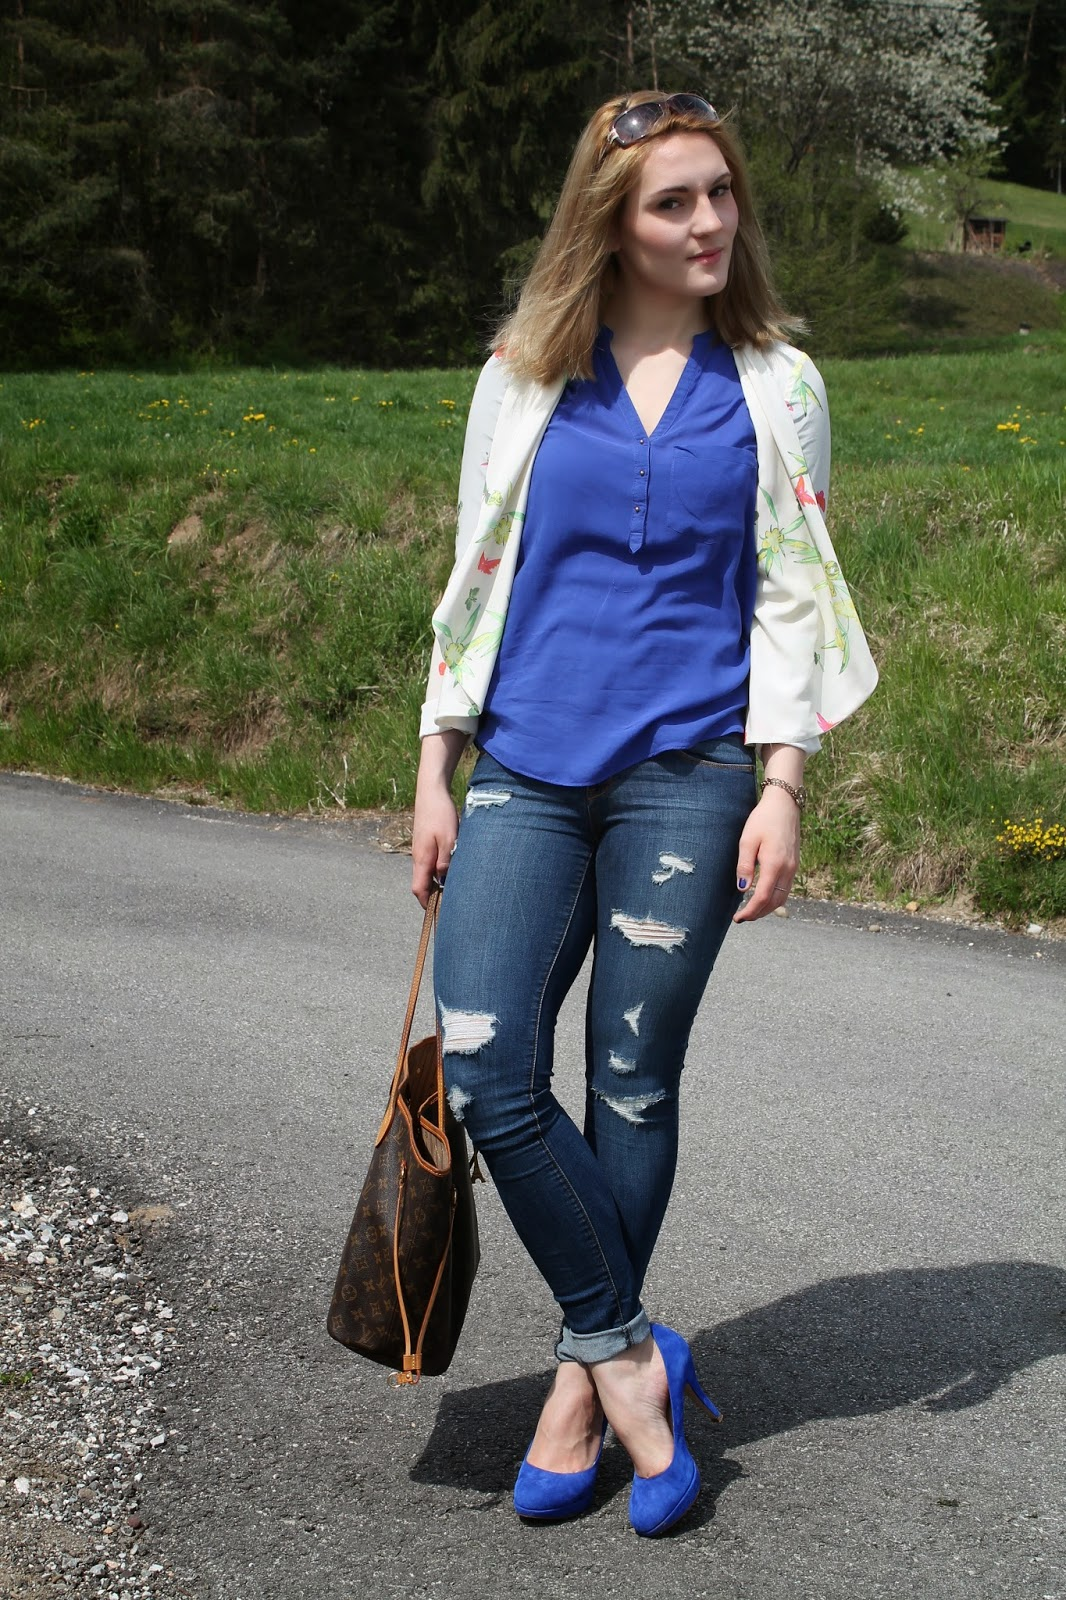 Fashionblogger Austria / Fashionblogger Österreich / Blogger Austria / Blogger Österreich / Kärnten / Carinthia / Köttmannsdorf / Lavender Star / Svetlana / Spring Look / Spring Style / Spring Outift / White Blazer / Flower Blazer / Heels Blue / Ripped Jeans / Louis Vuitton Neverfull / Zara / Deichmann /